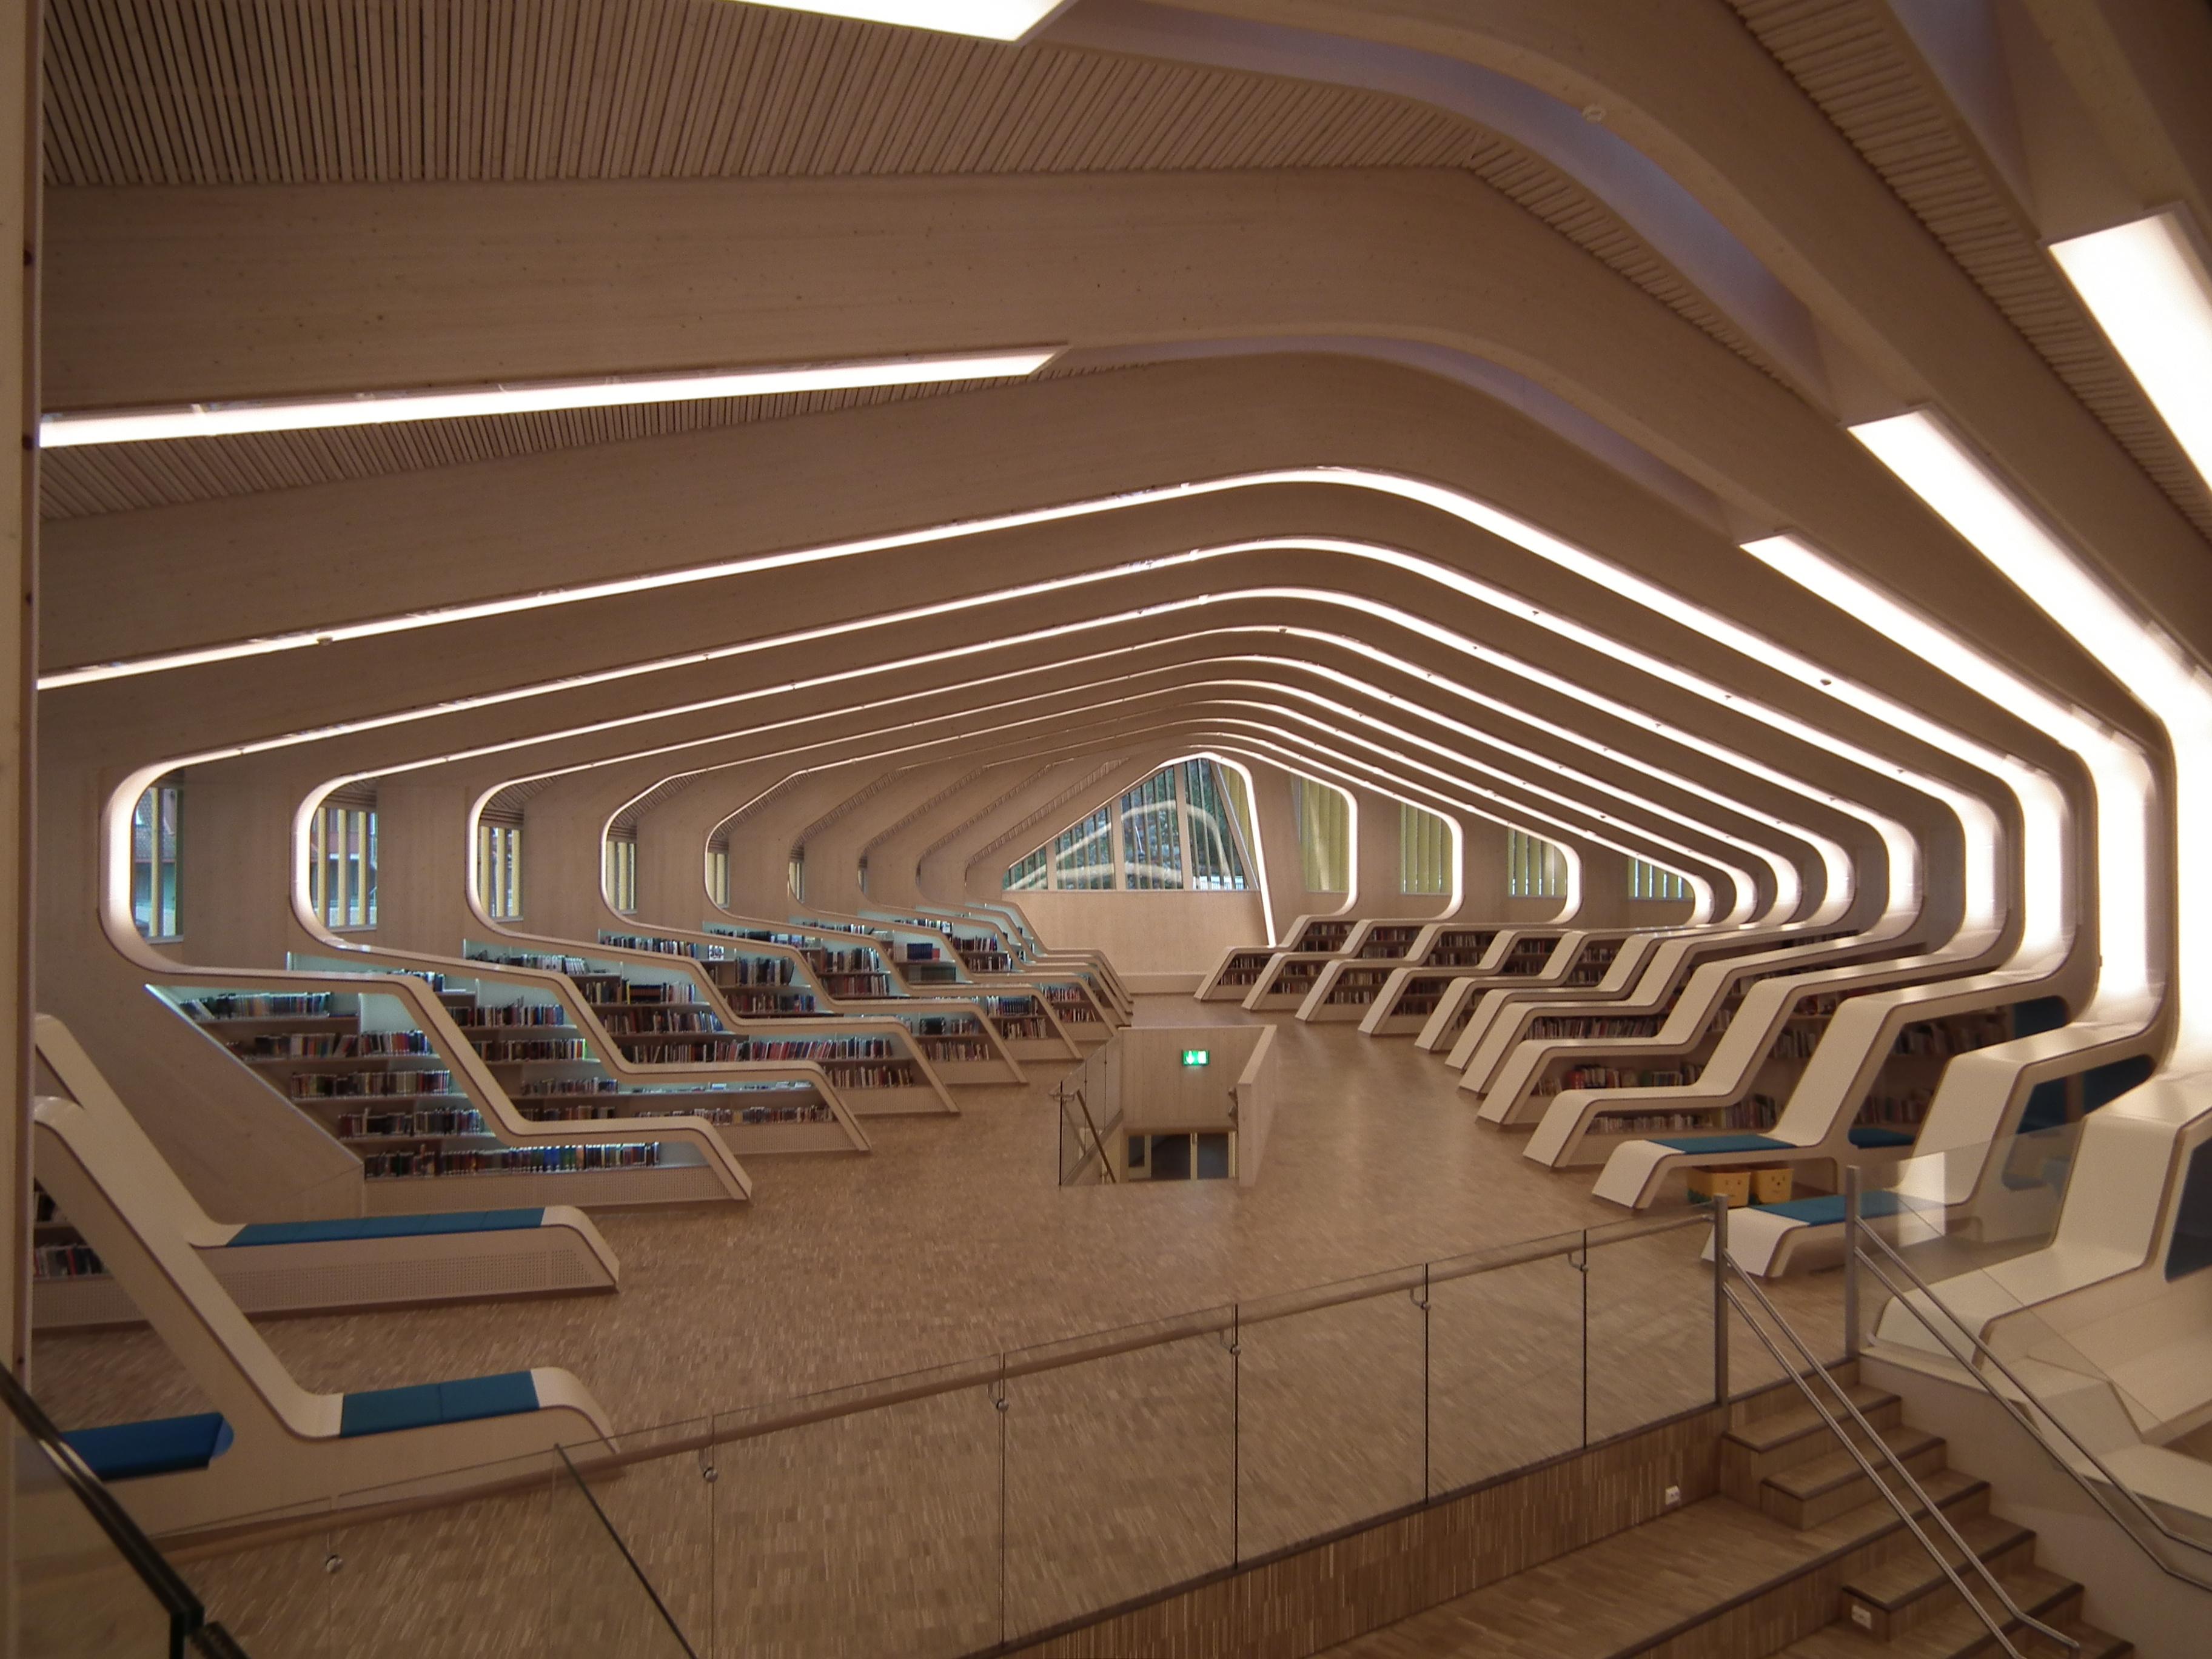 Vennesla bibliotek, bokavdelingen